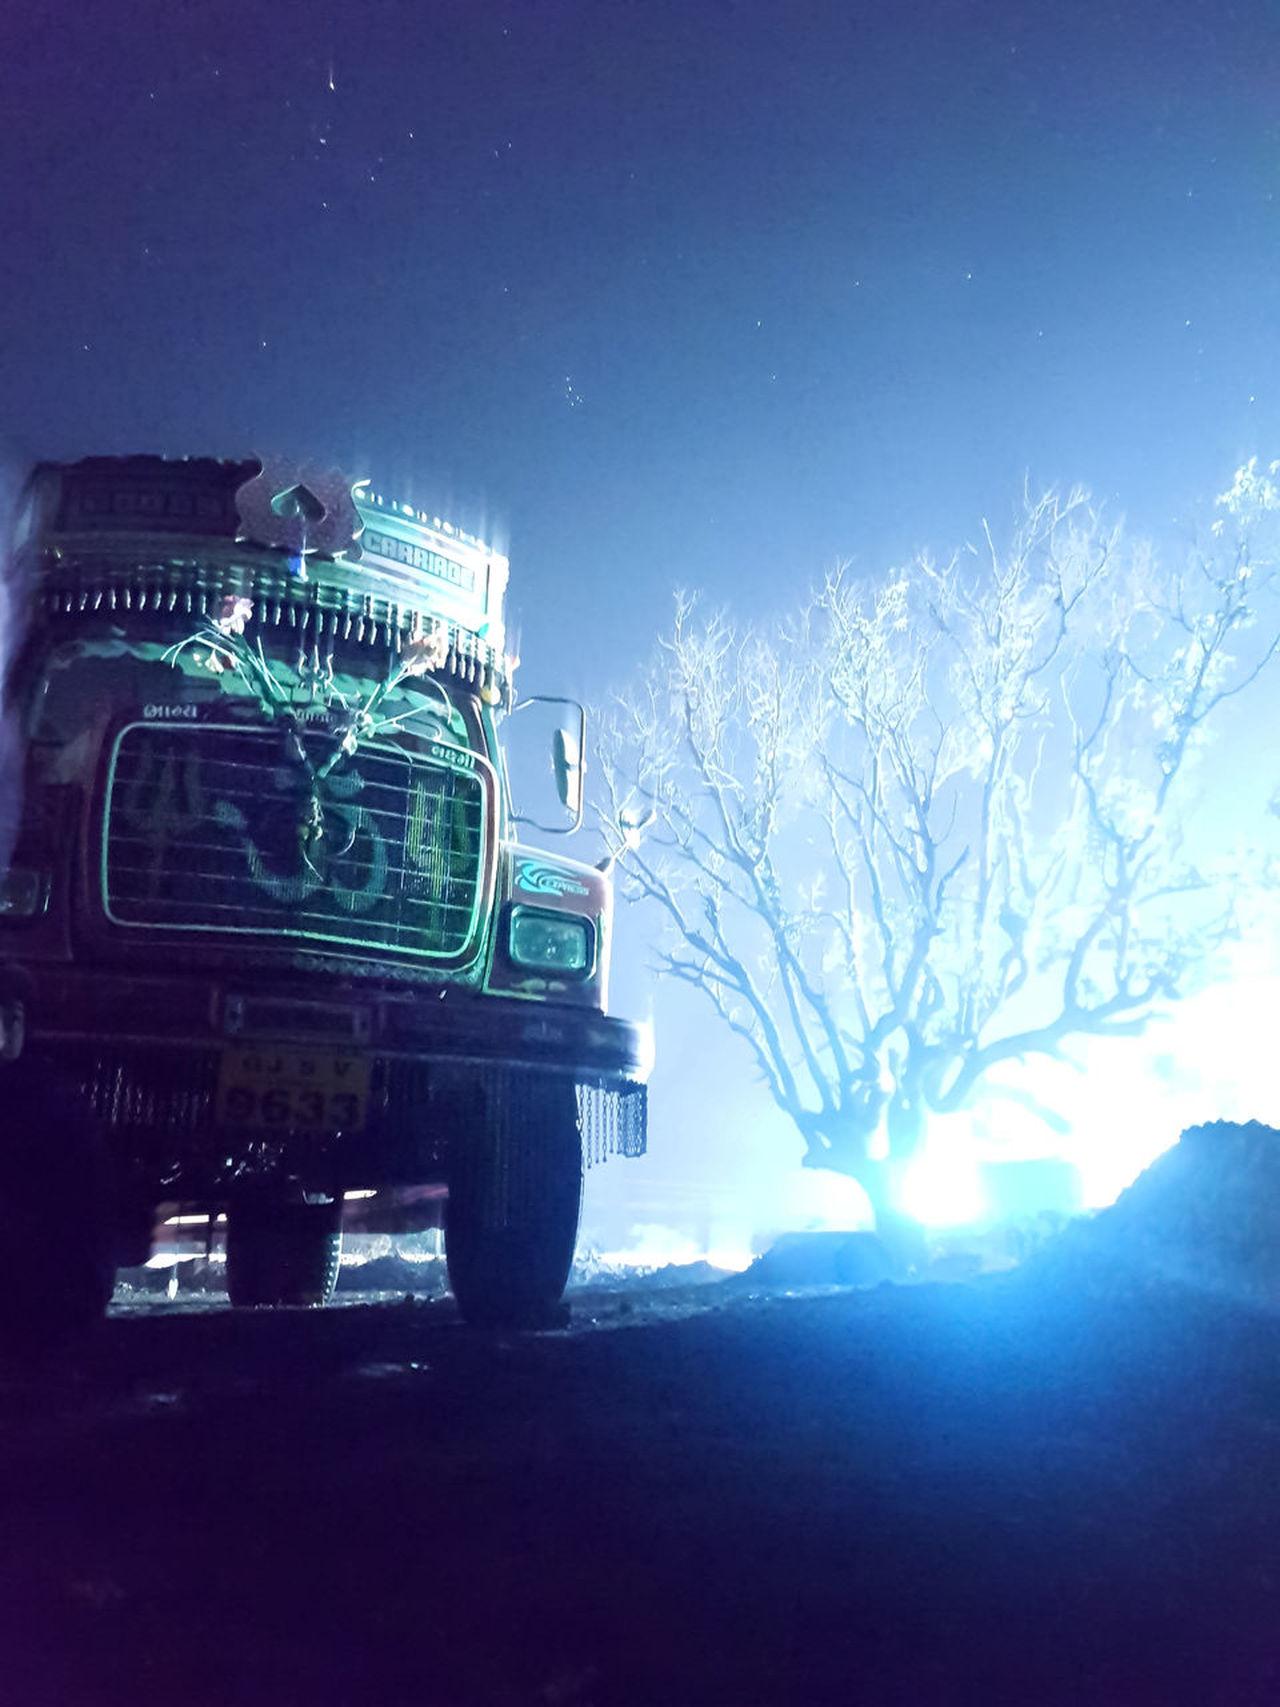 Them stars 😍 Night Sky Stars Starry Night Blue Dark Long Exposure Wallpapers No People Nature Truck Vehicle